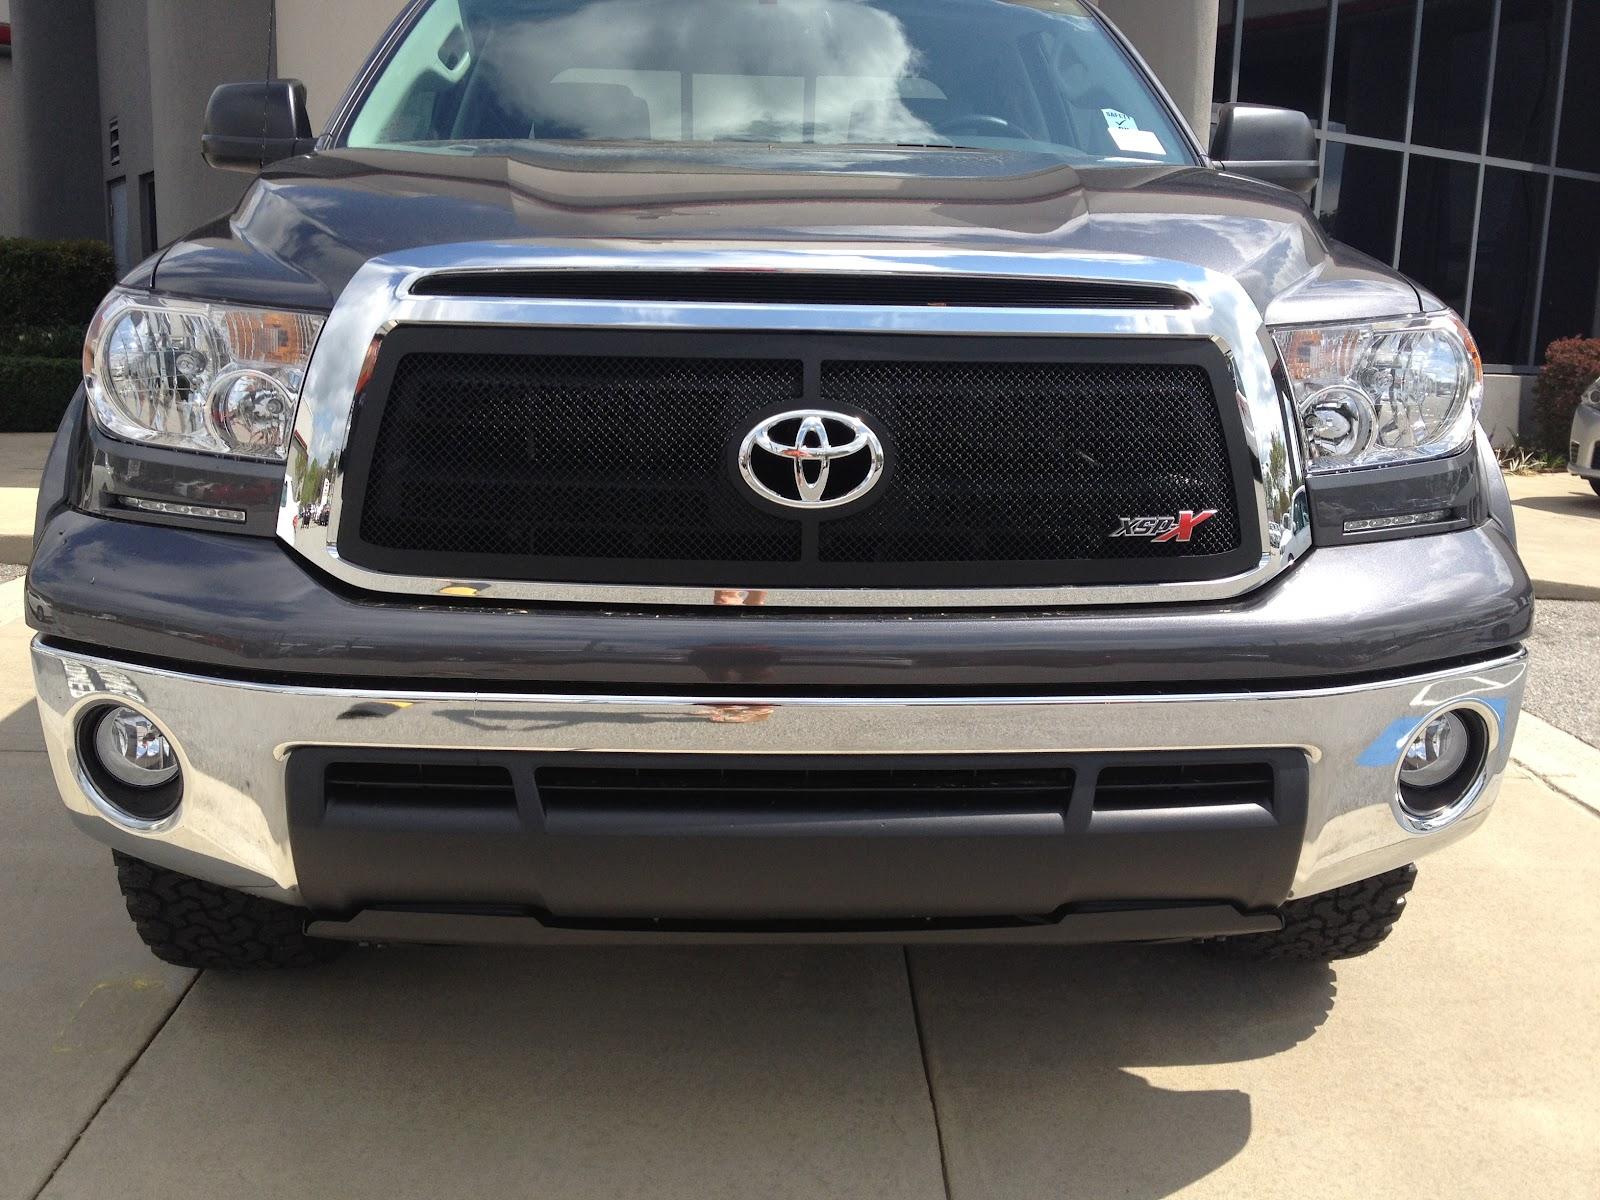 Rice Toyota Scion: Toyota Tundra XSP-X Special Edition ...